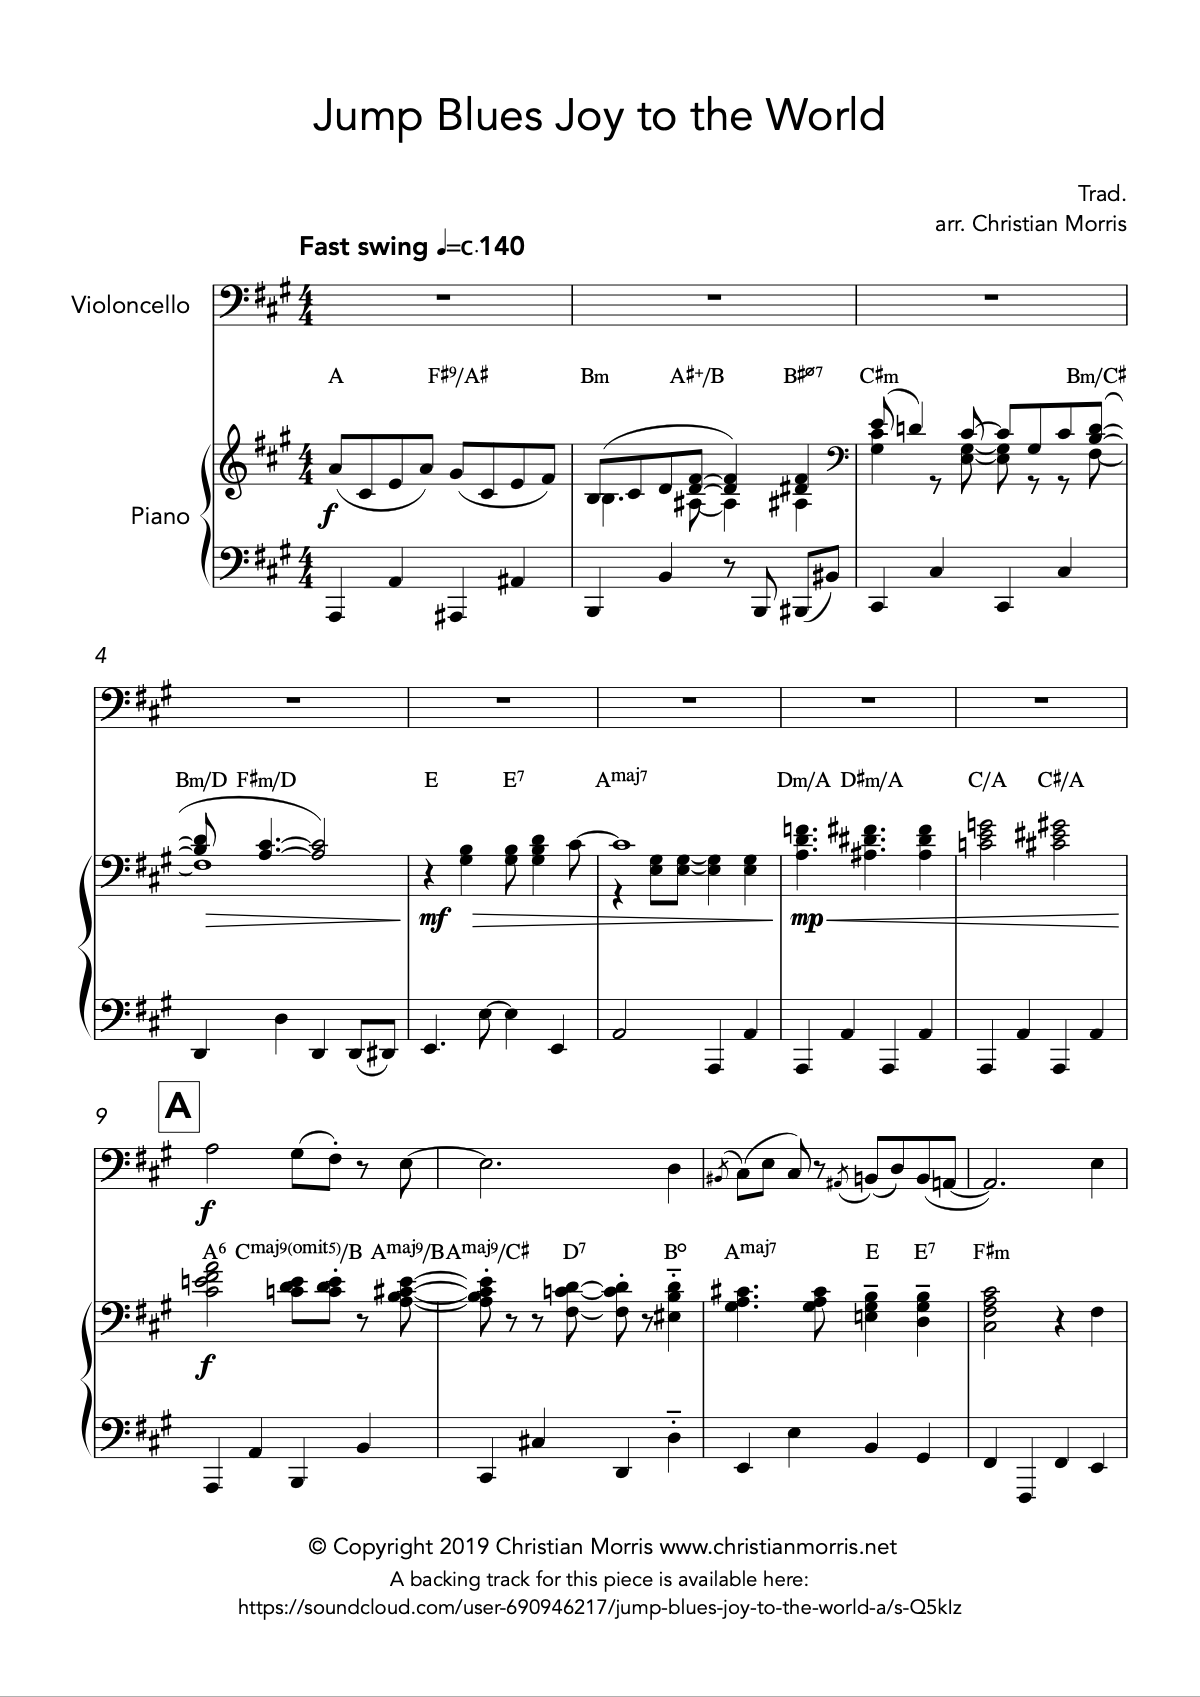 Jump Blues Joy to the World (Violin)